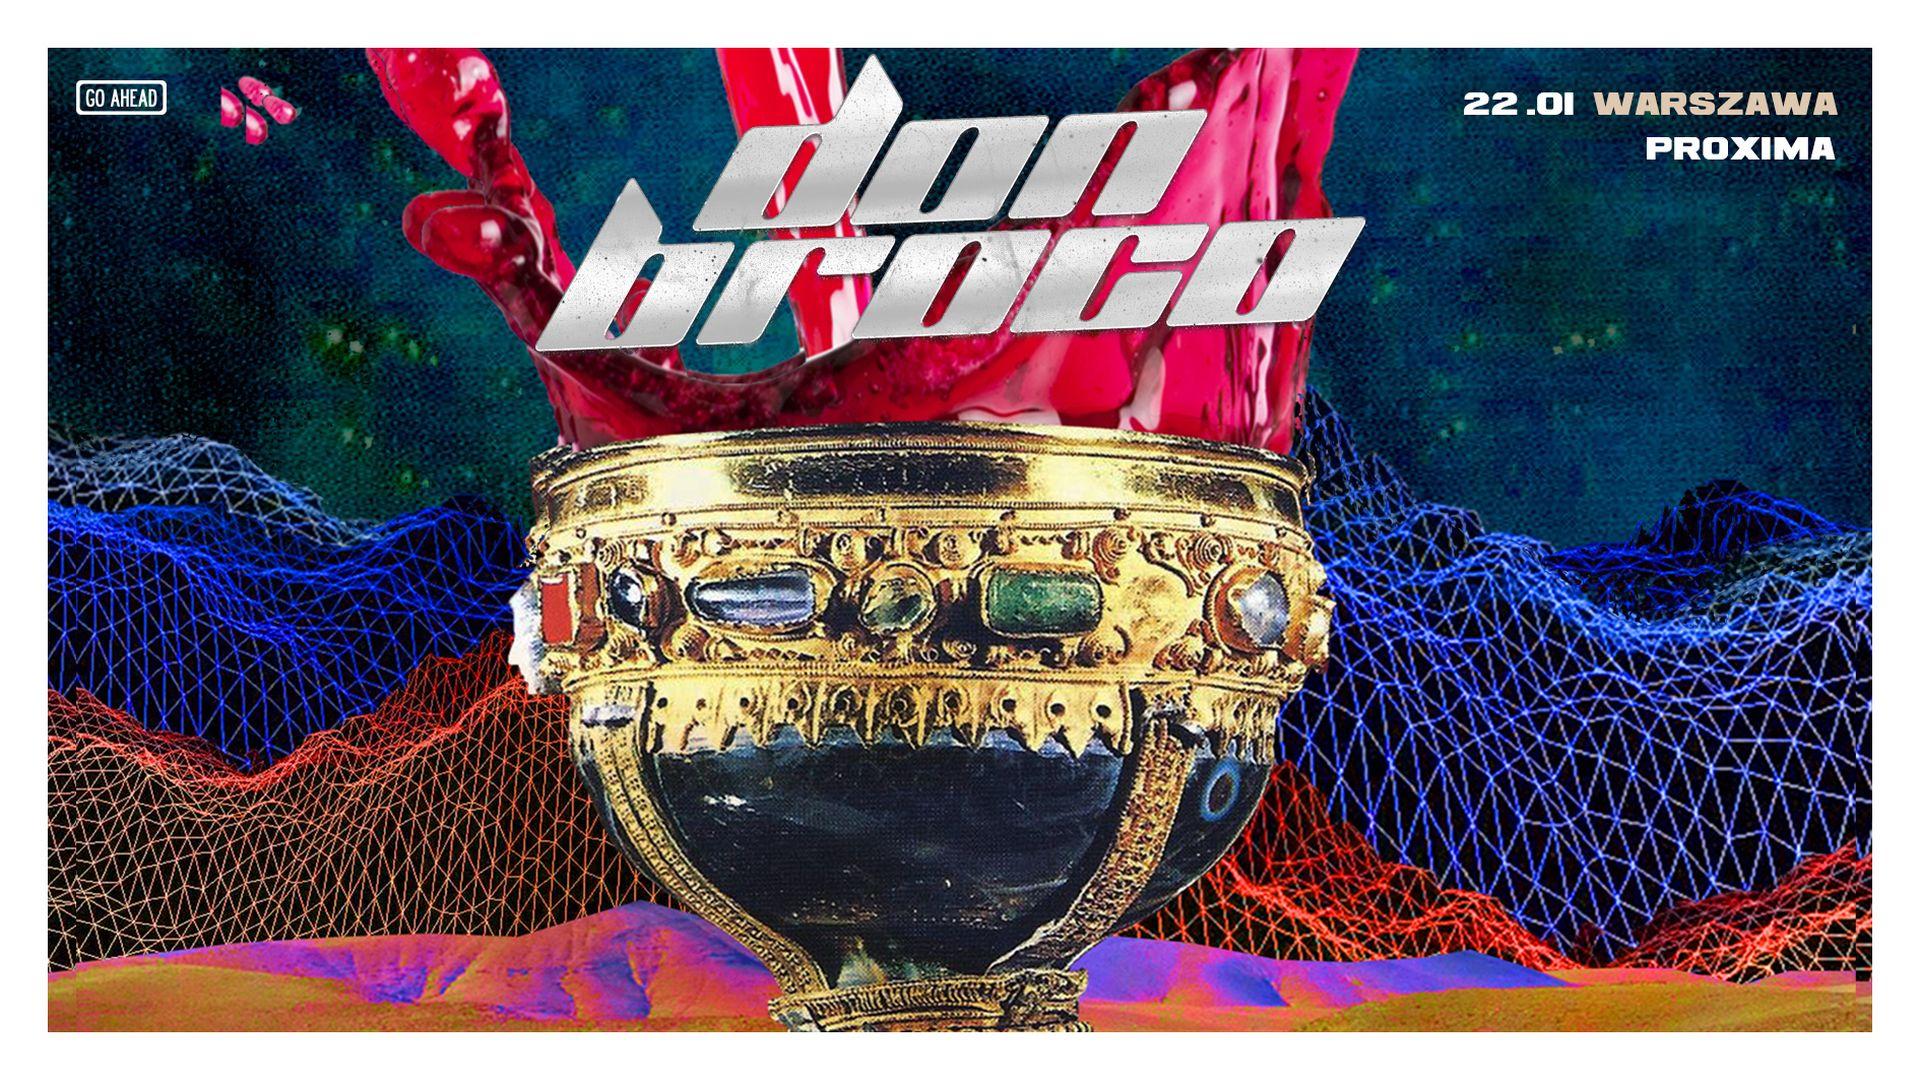 Bilety kolekcjonerskie - Don Broco